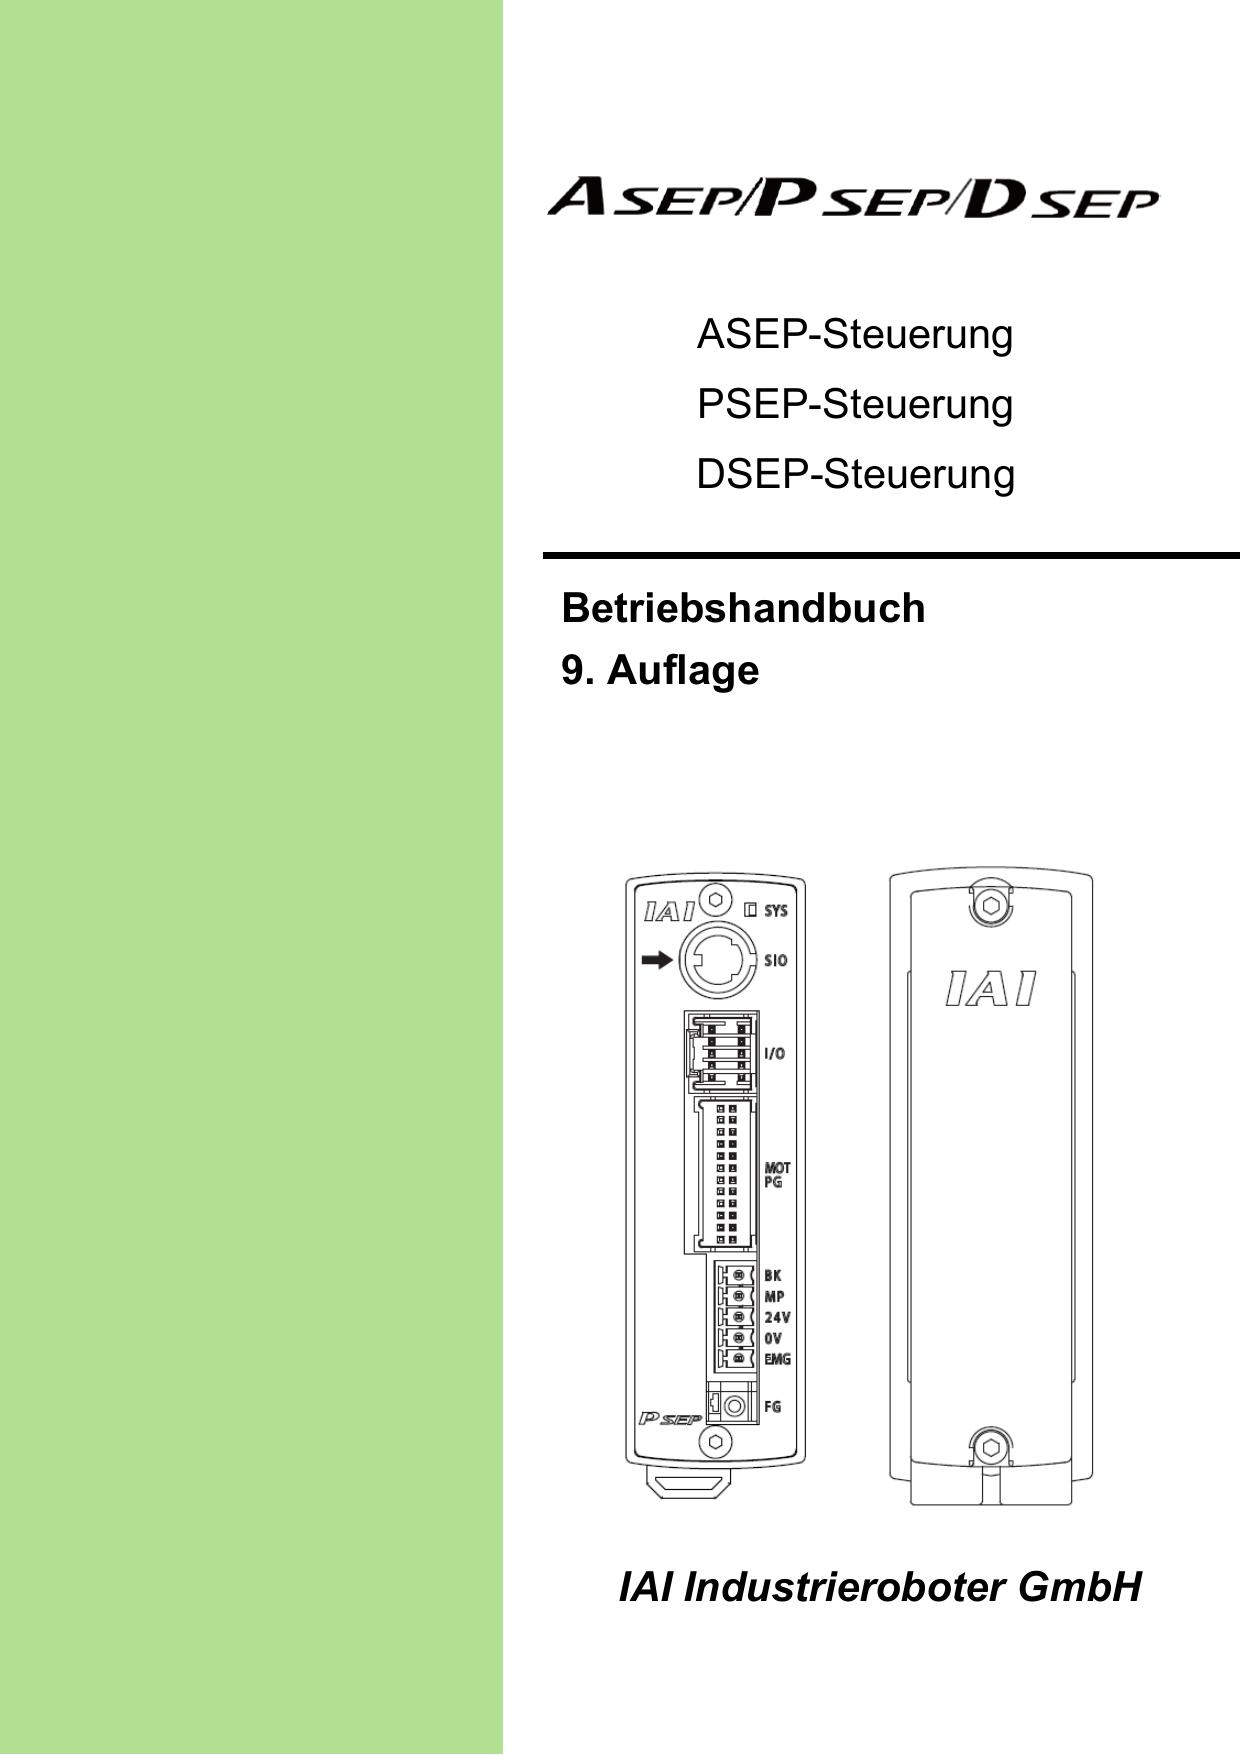 ASEP_PSEP_DSEP(MD0267 | manualzz.com